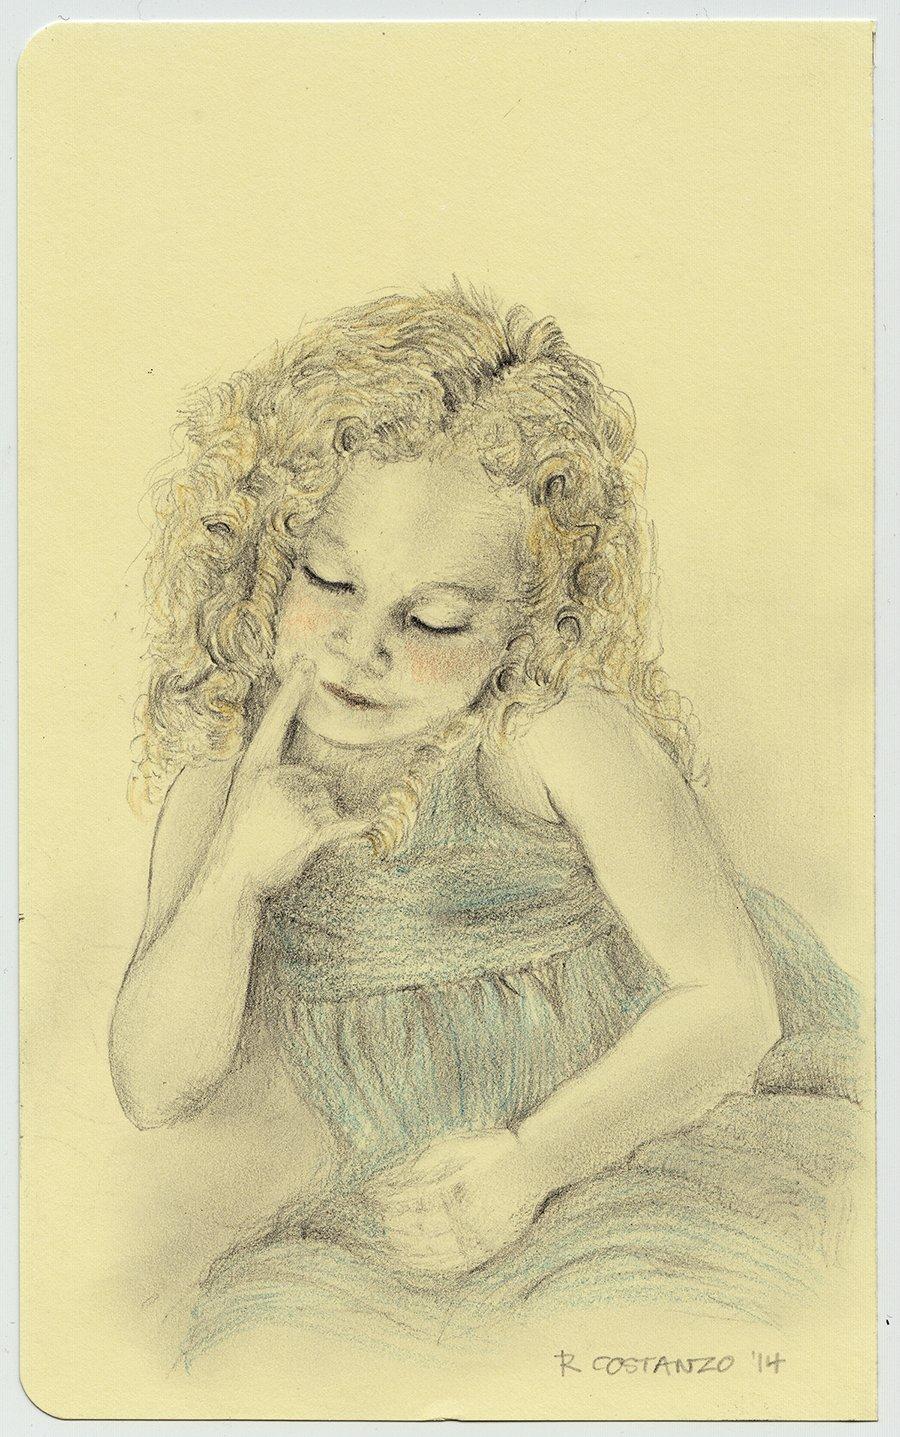 Custom Child Portrait from Photograph